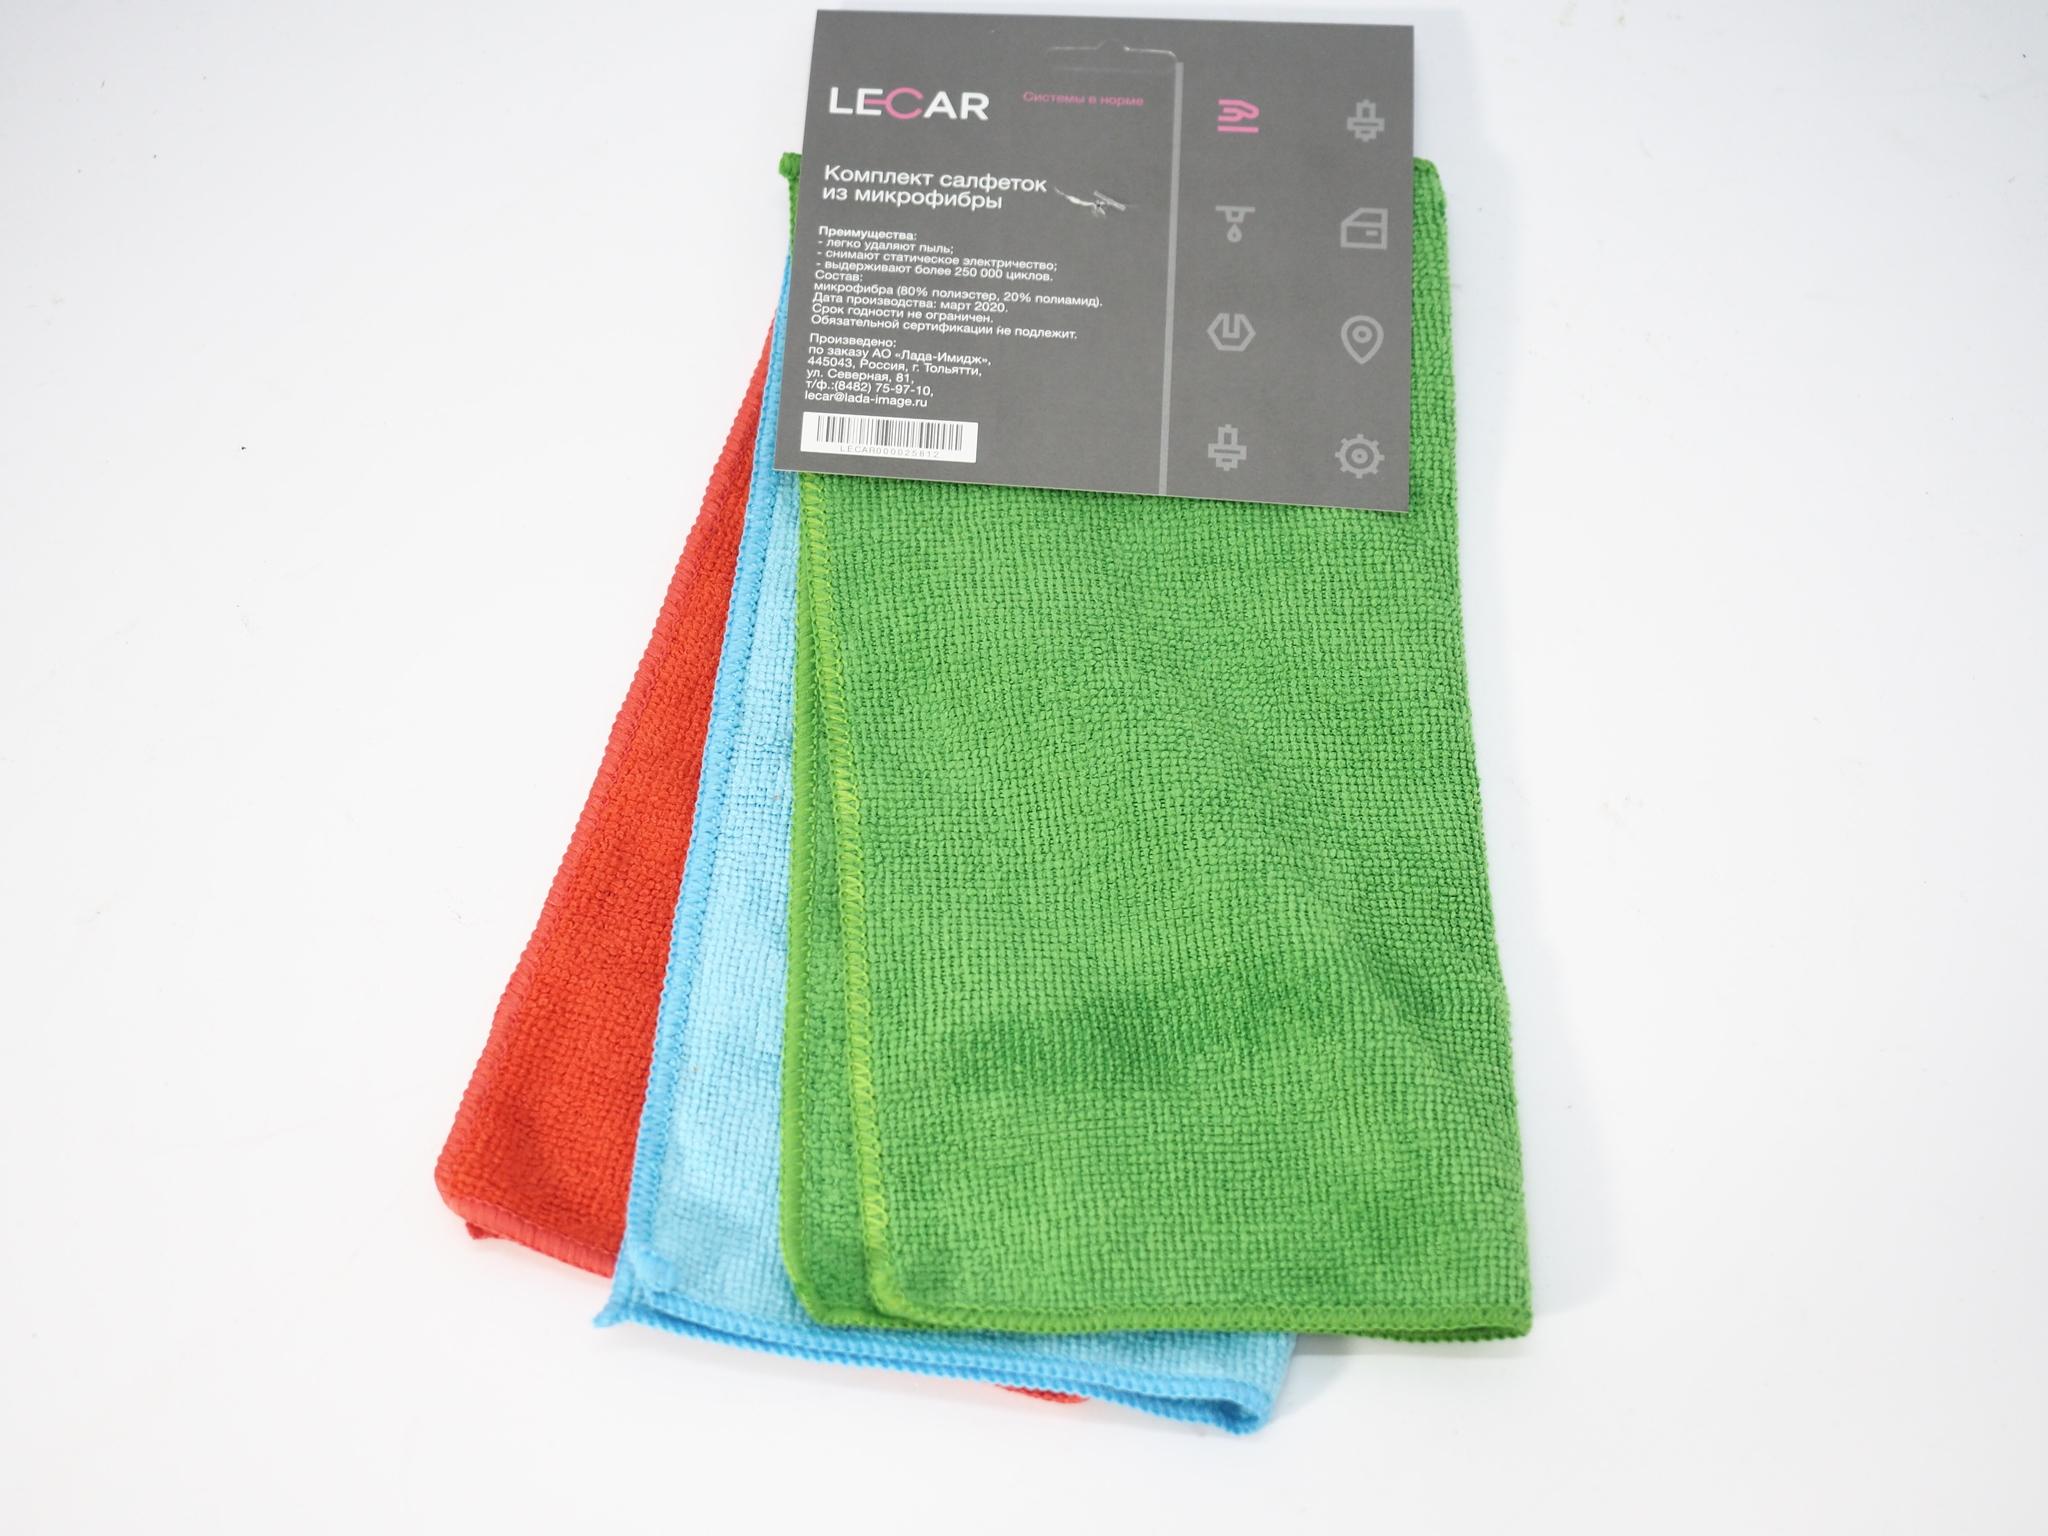 Комплект салфеток из микрофибры LECAR 300 х 300 мм (3 шт.)